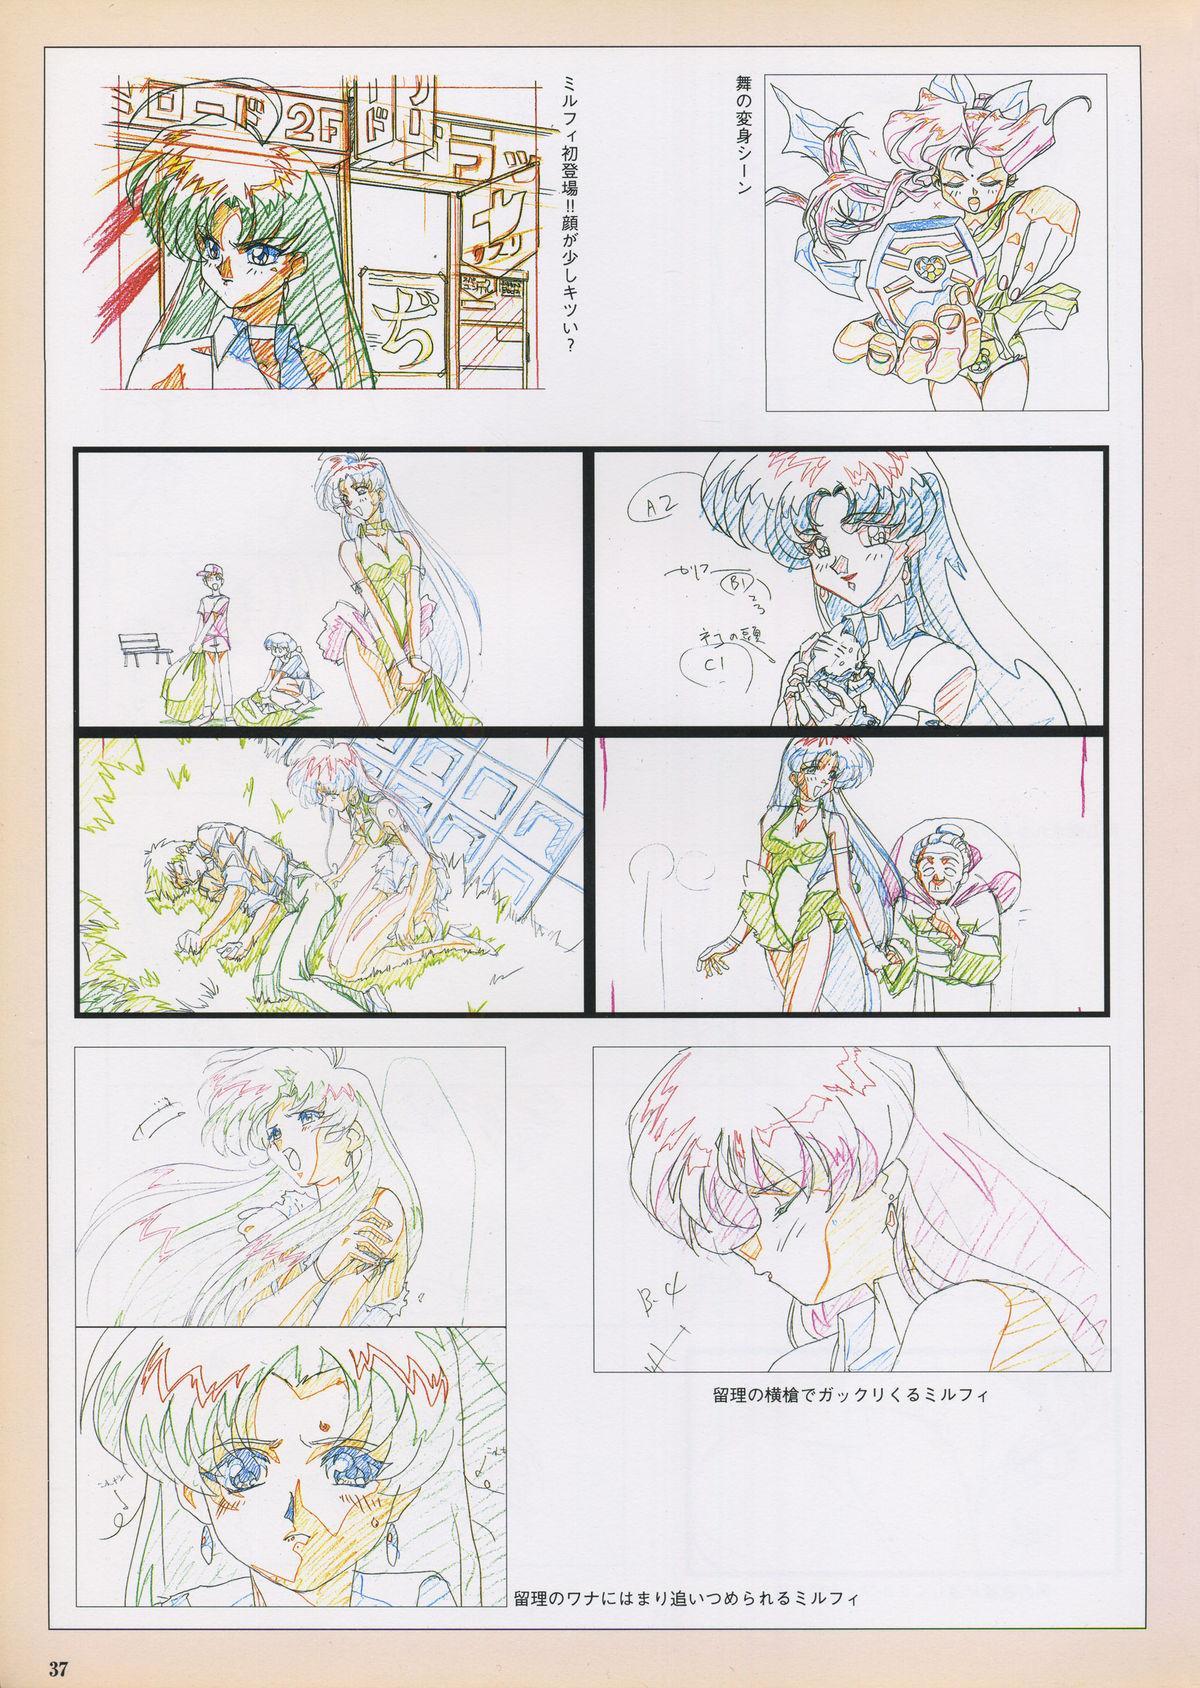 VIPER Series Official Artbook III 39